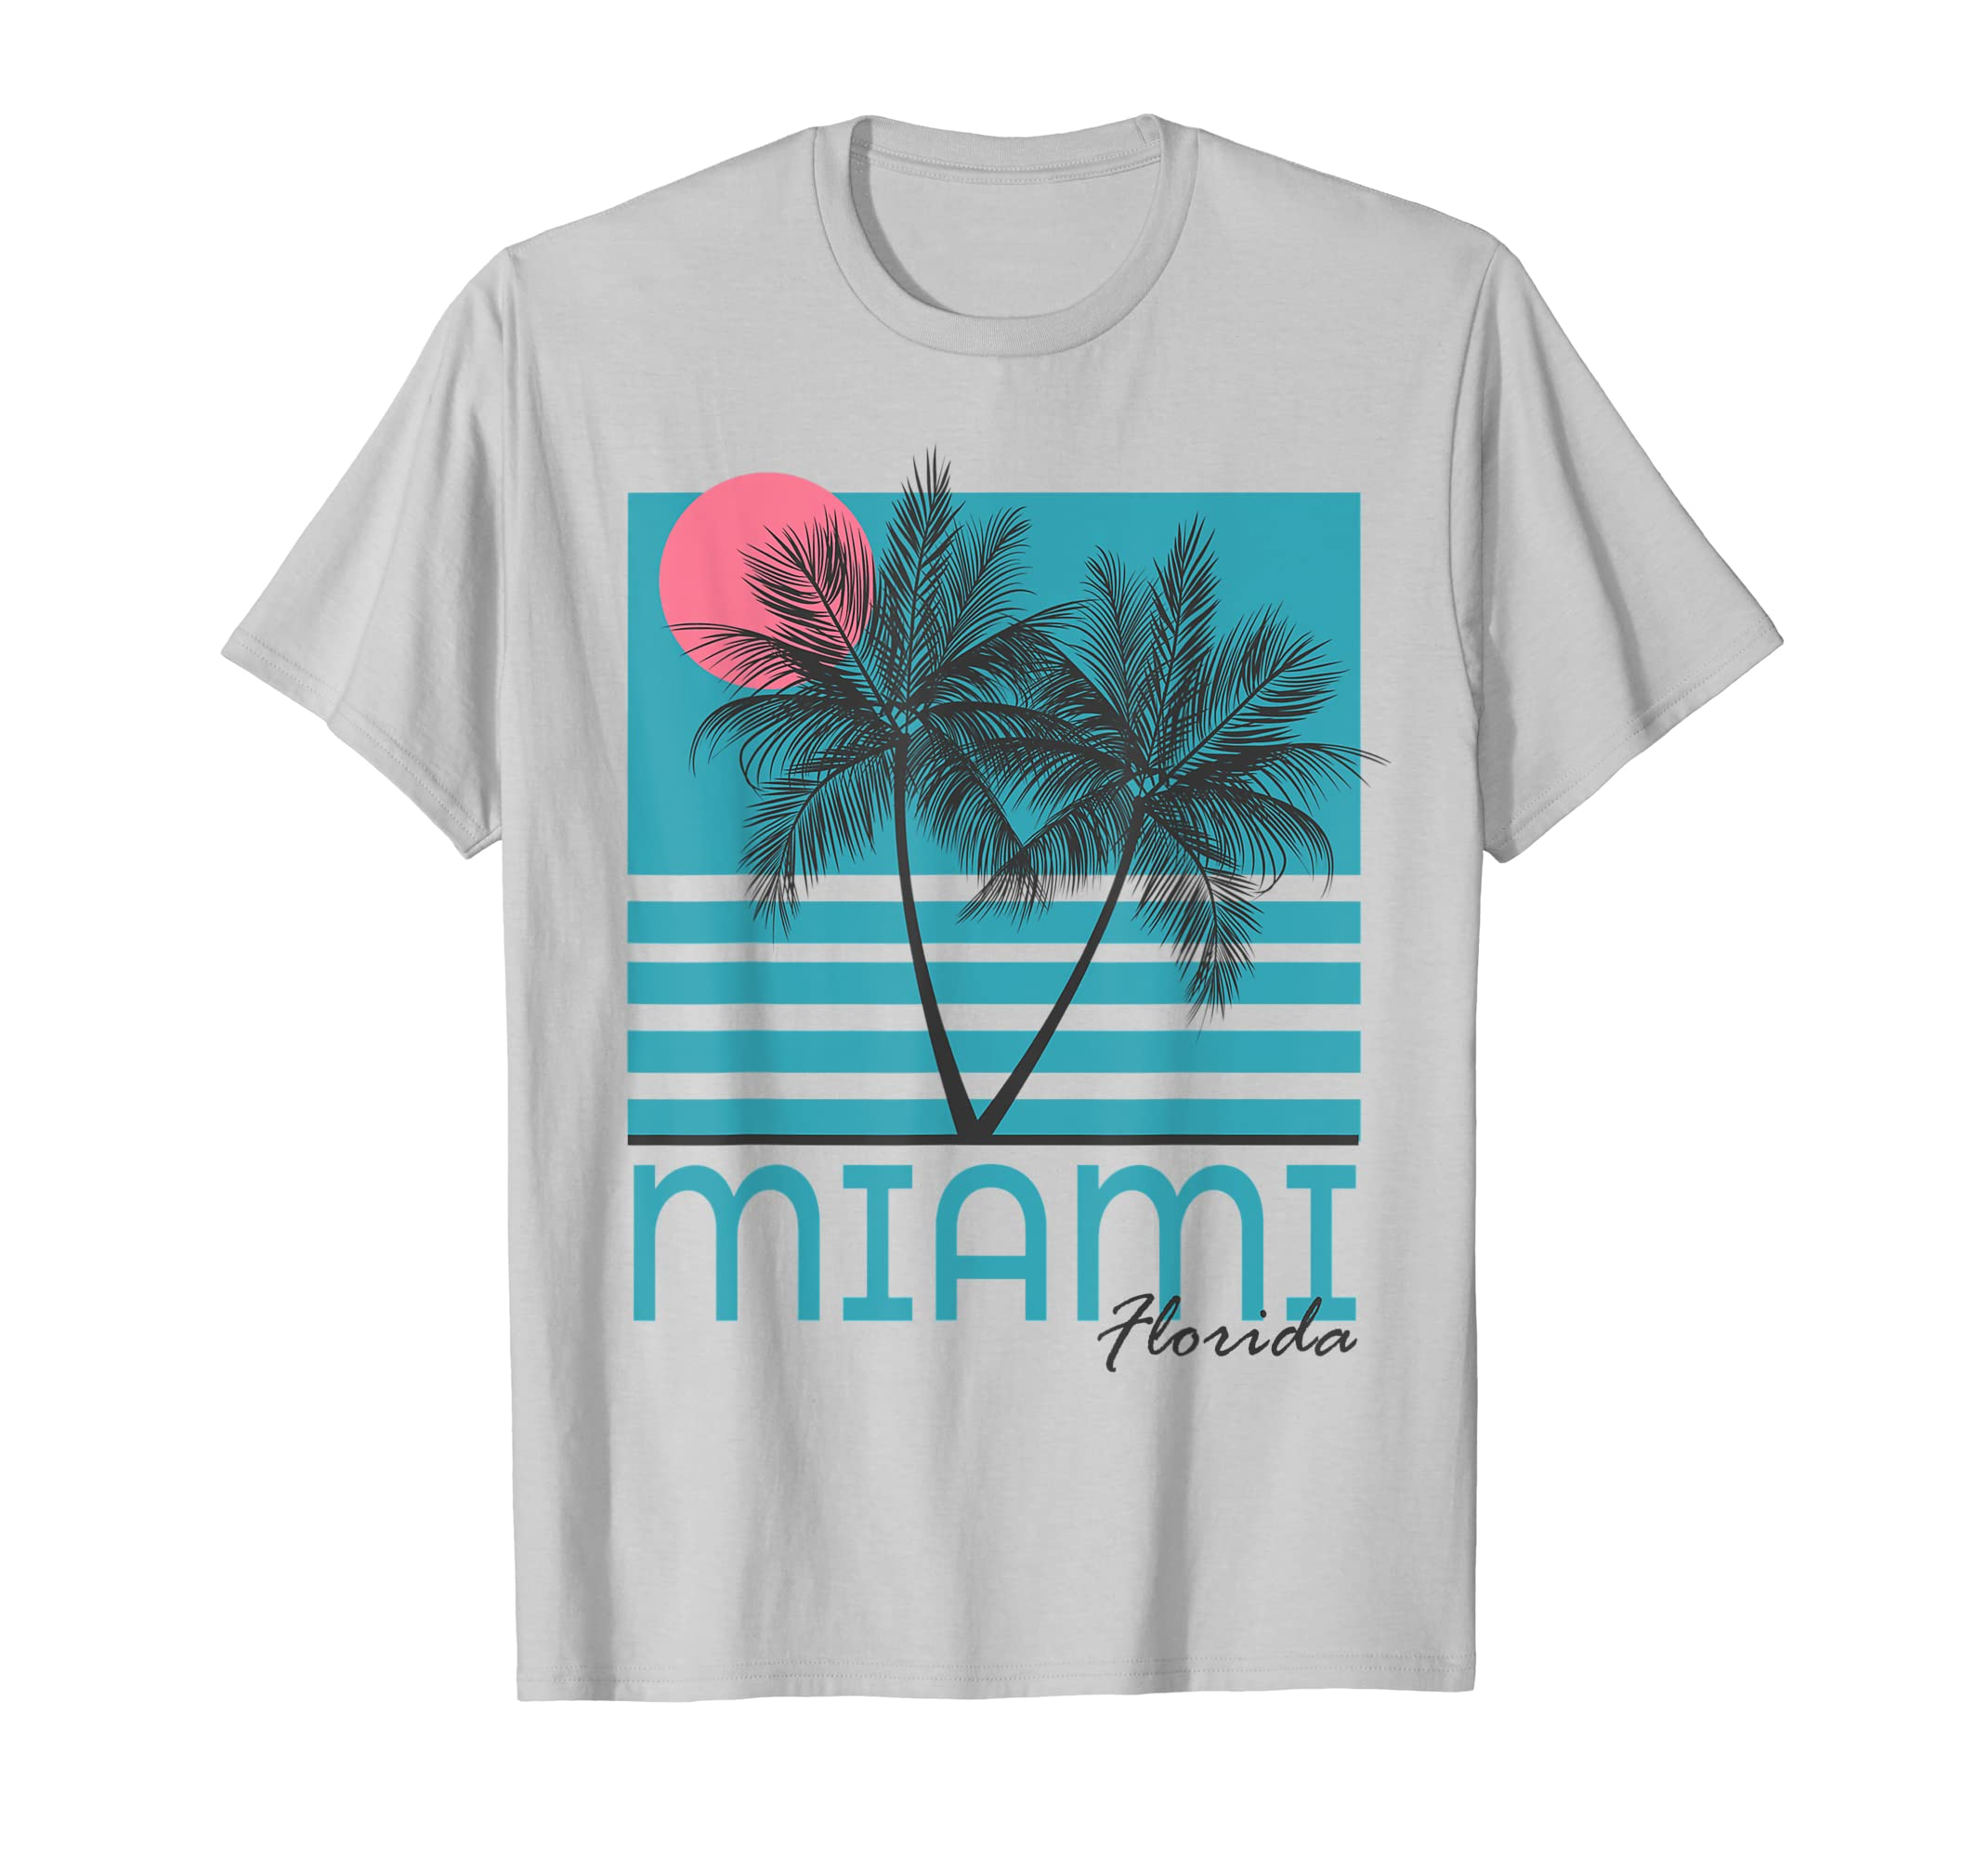 93d061002867fe Amazon.com  Miami Beach Florida T Shirt Palm Trees Souvenirs  Clothing